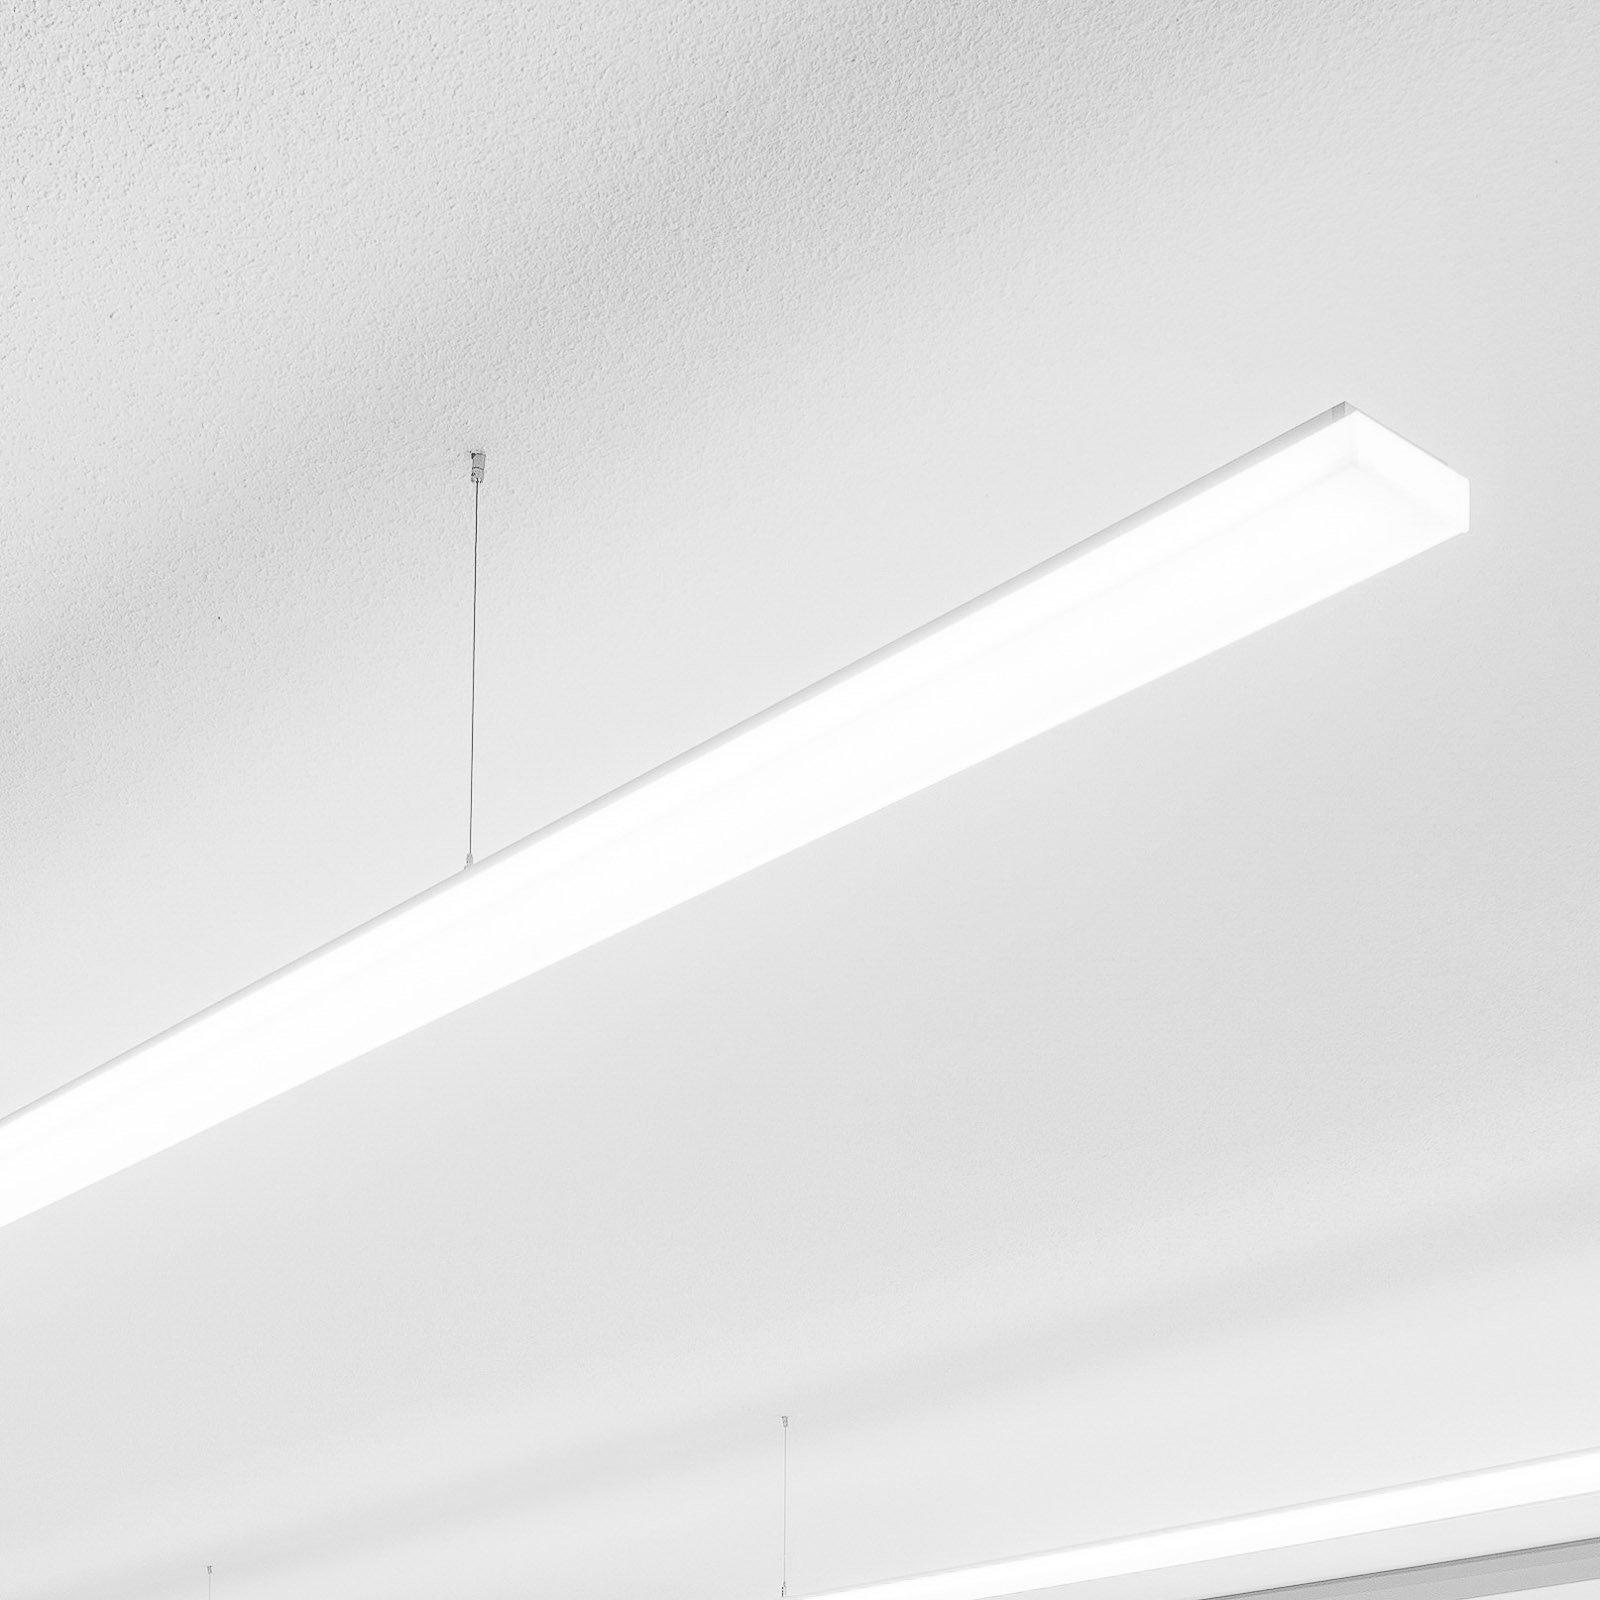 Regent Purelite Office taklampe 153,1 cm 4 000 K